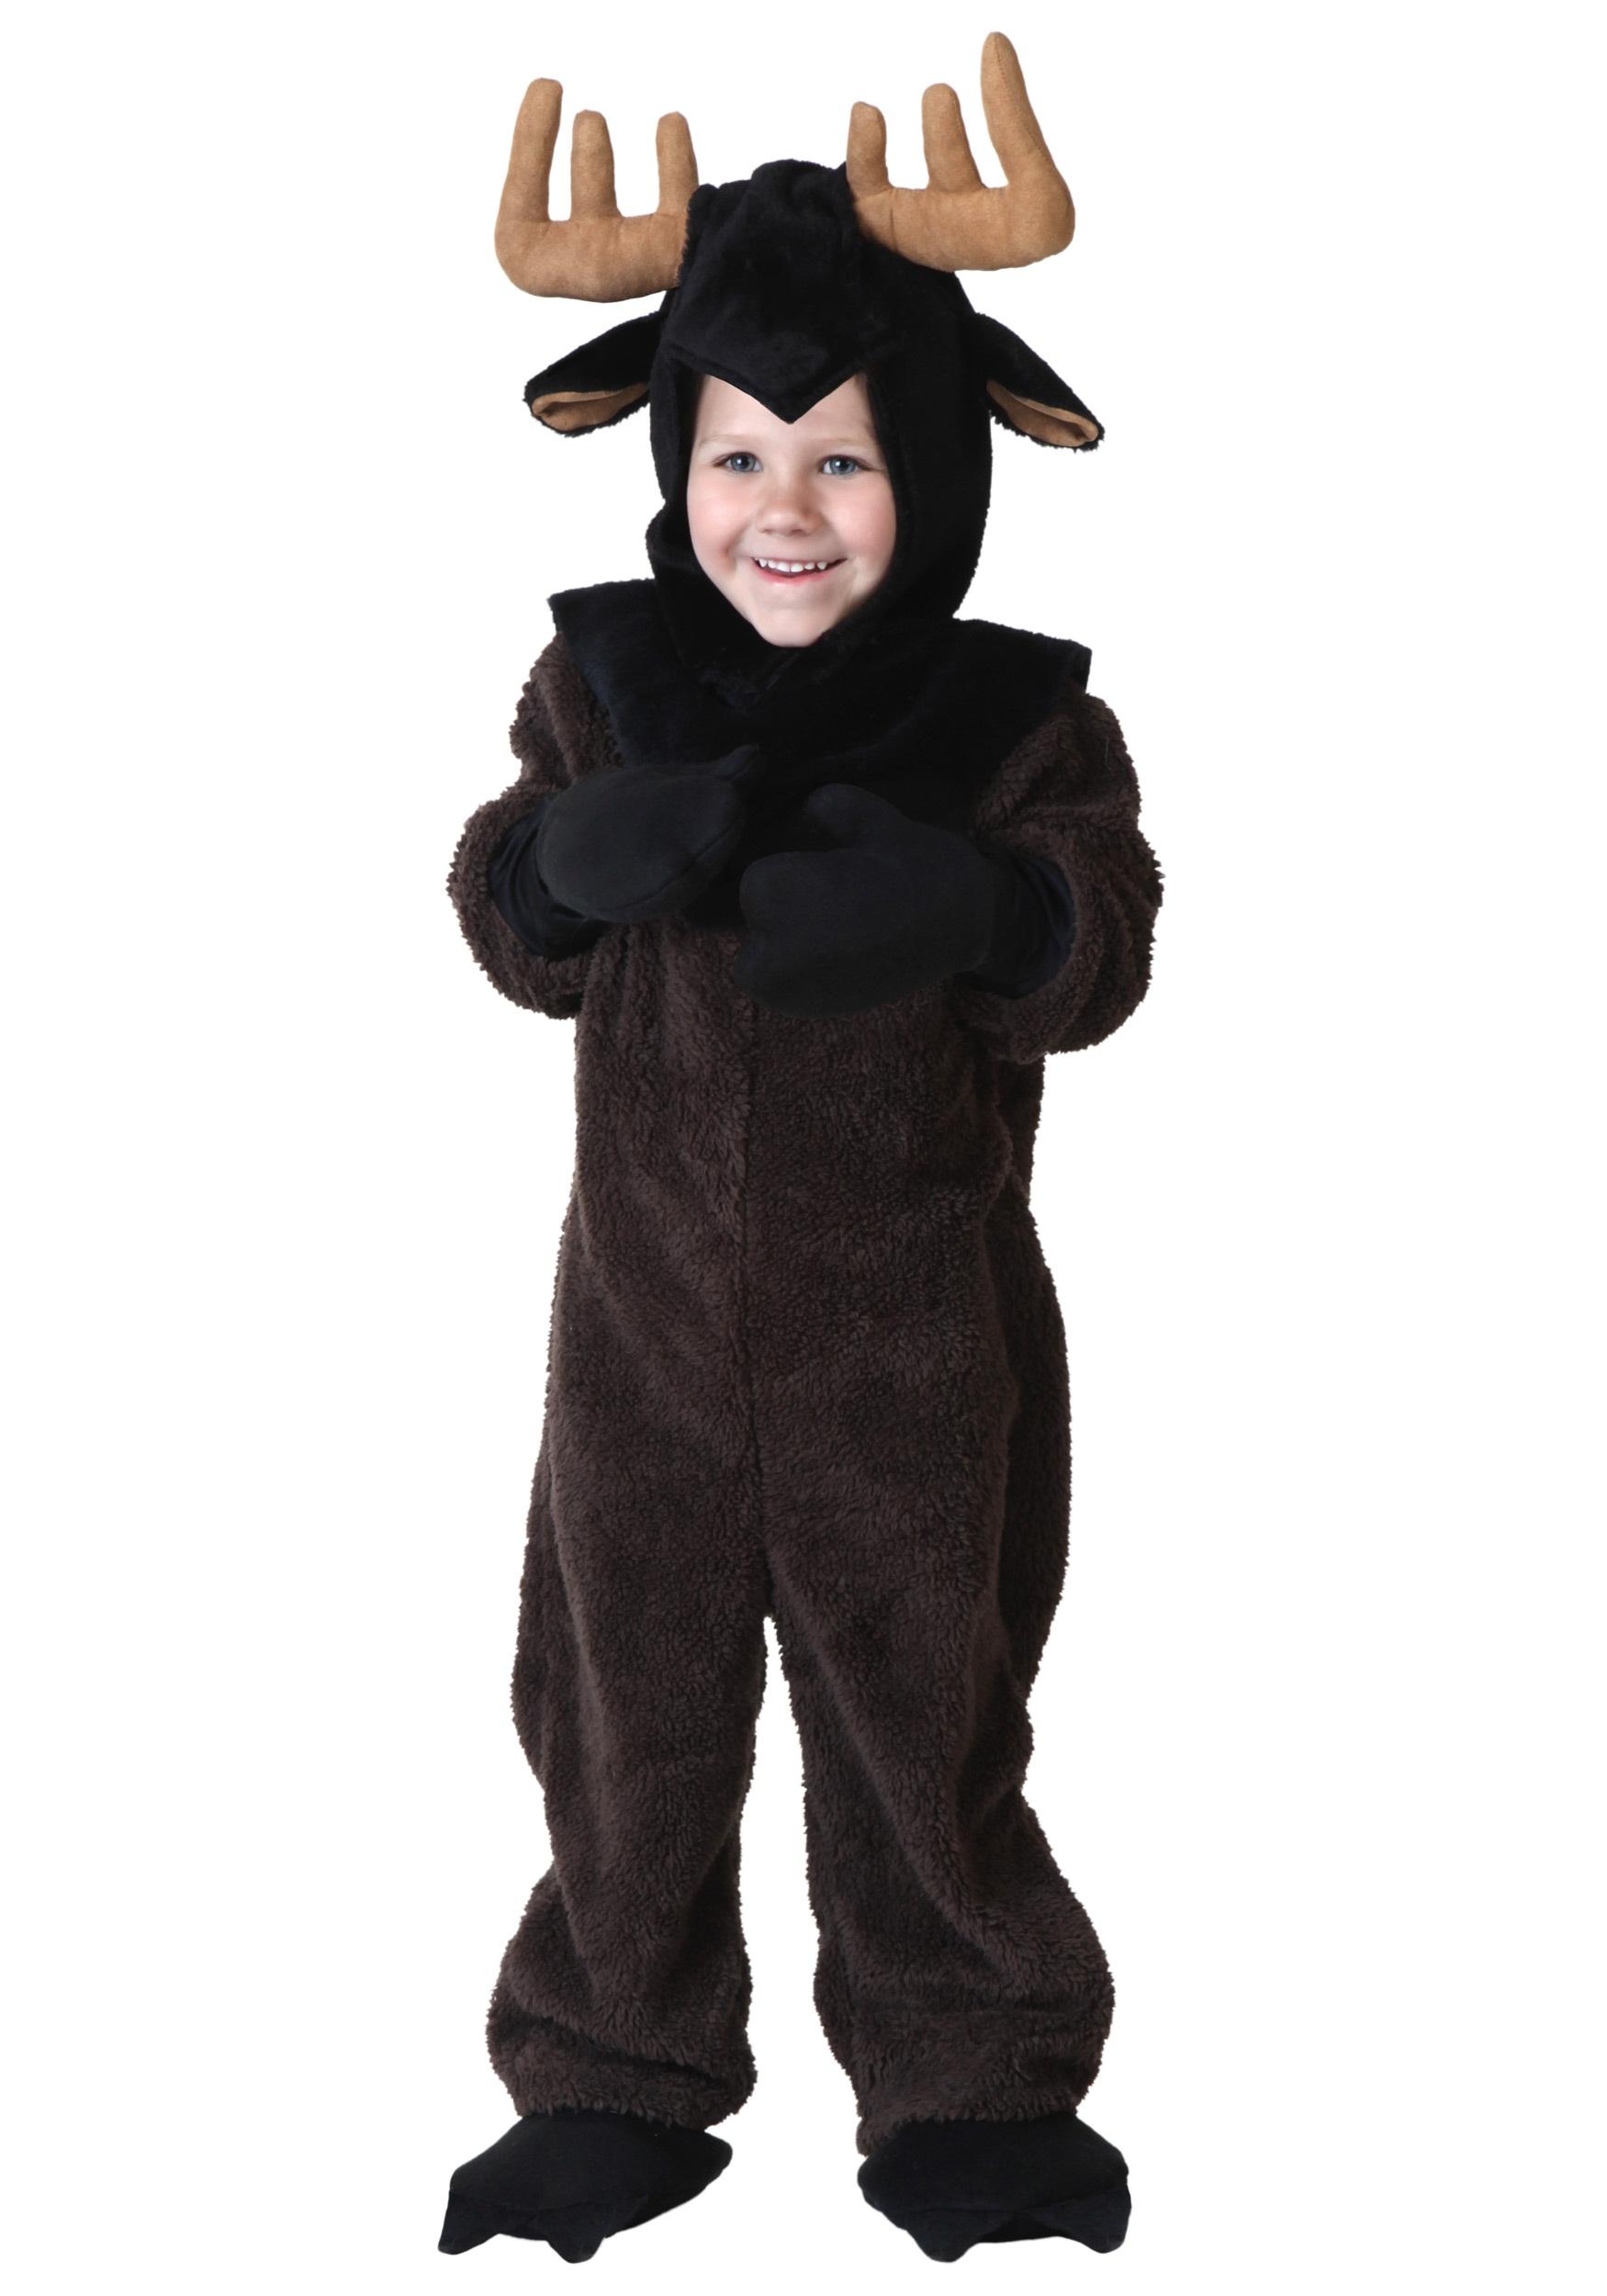 Toddler Moose Costume  sc 1 st  Halloween Costumes & Toddler Moose Costume - Halloween Costumes